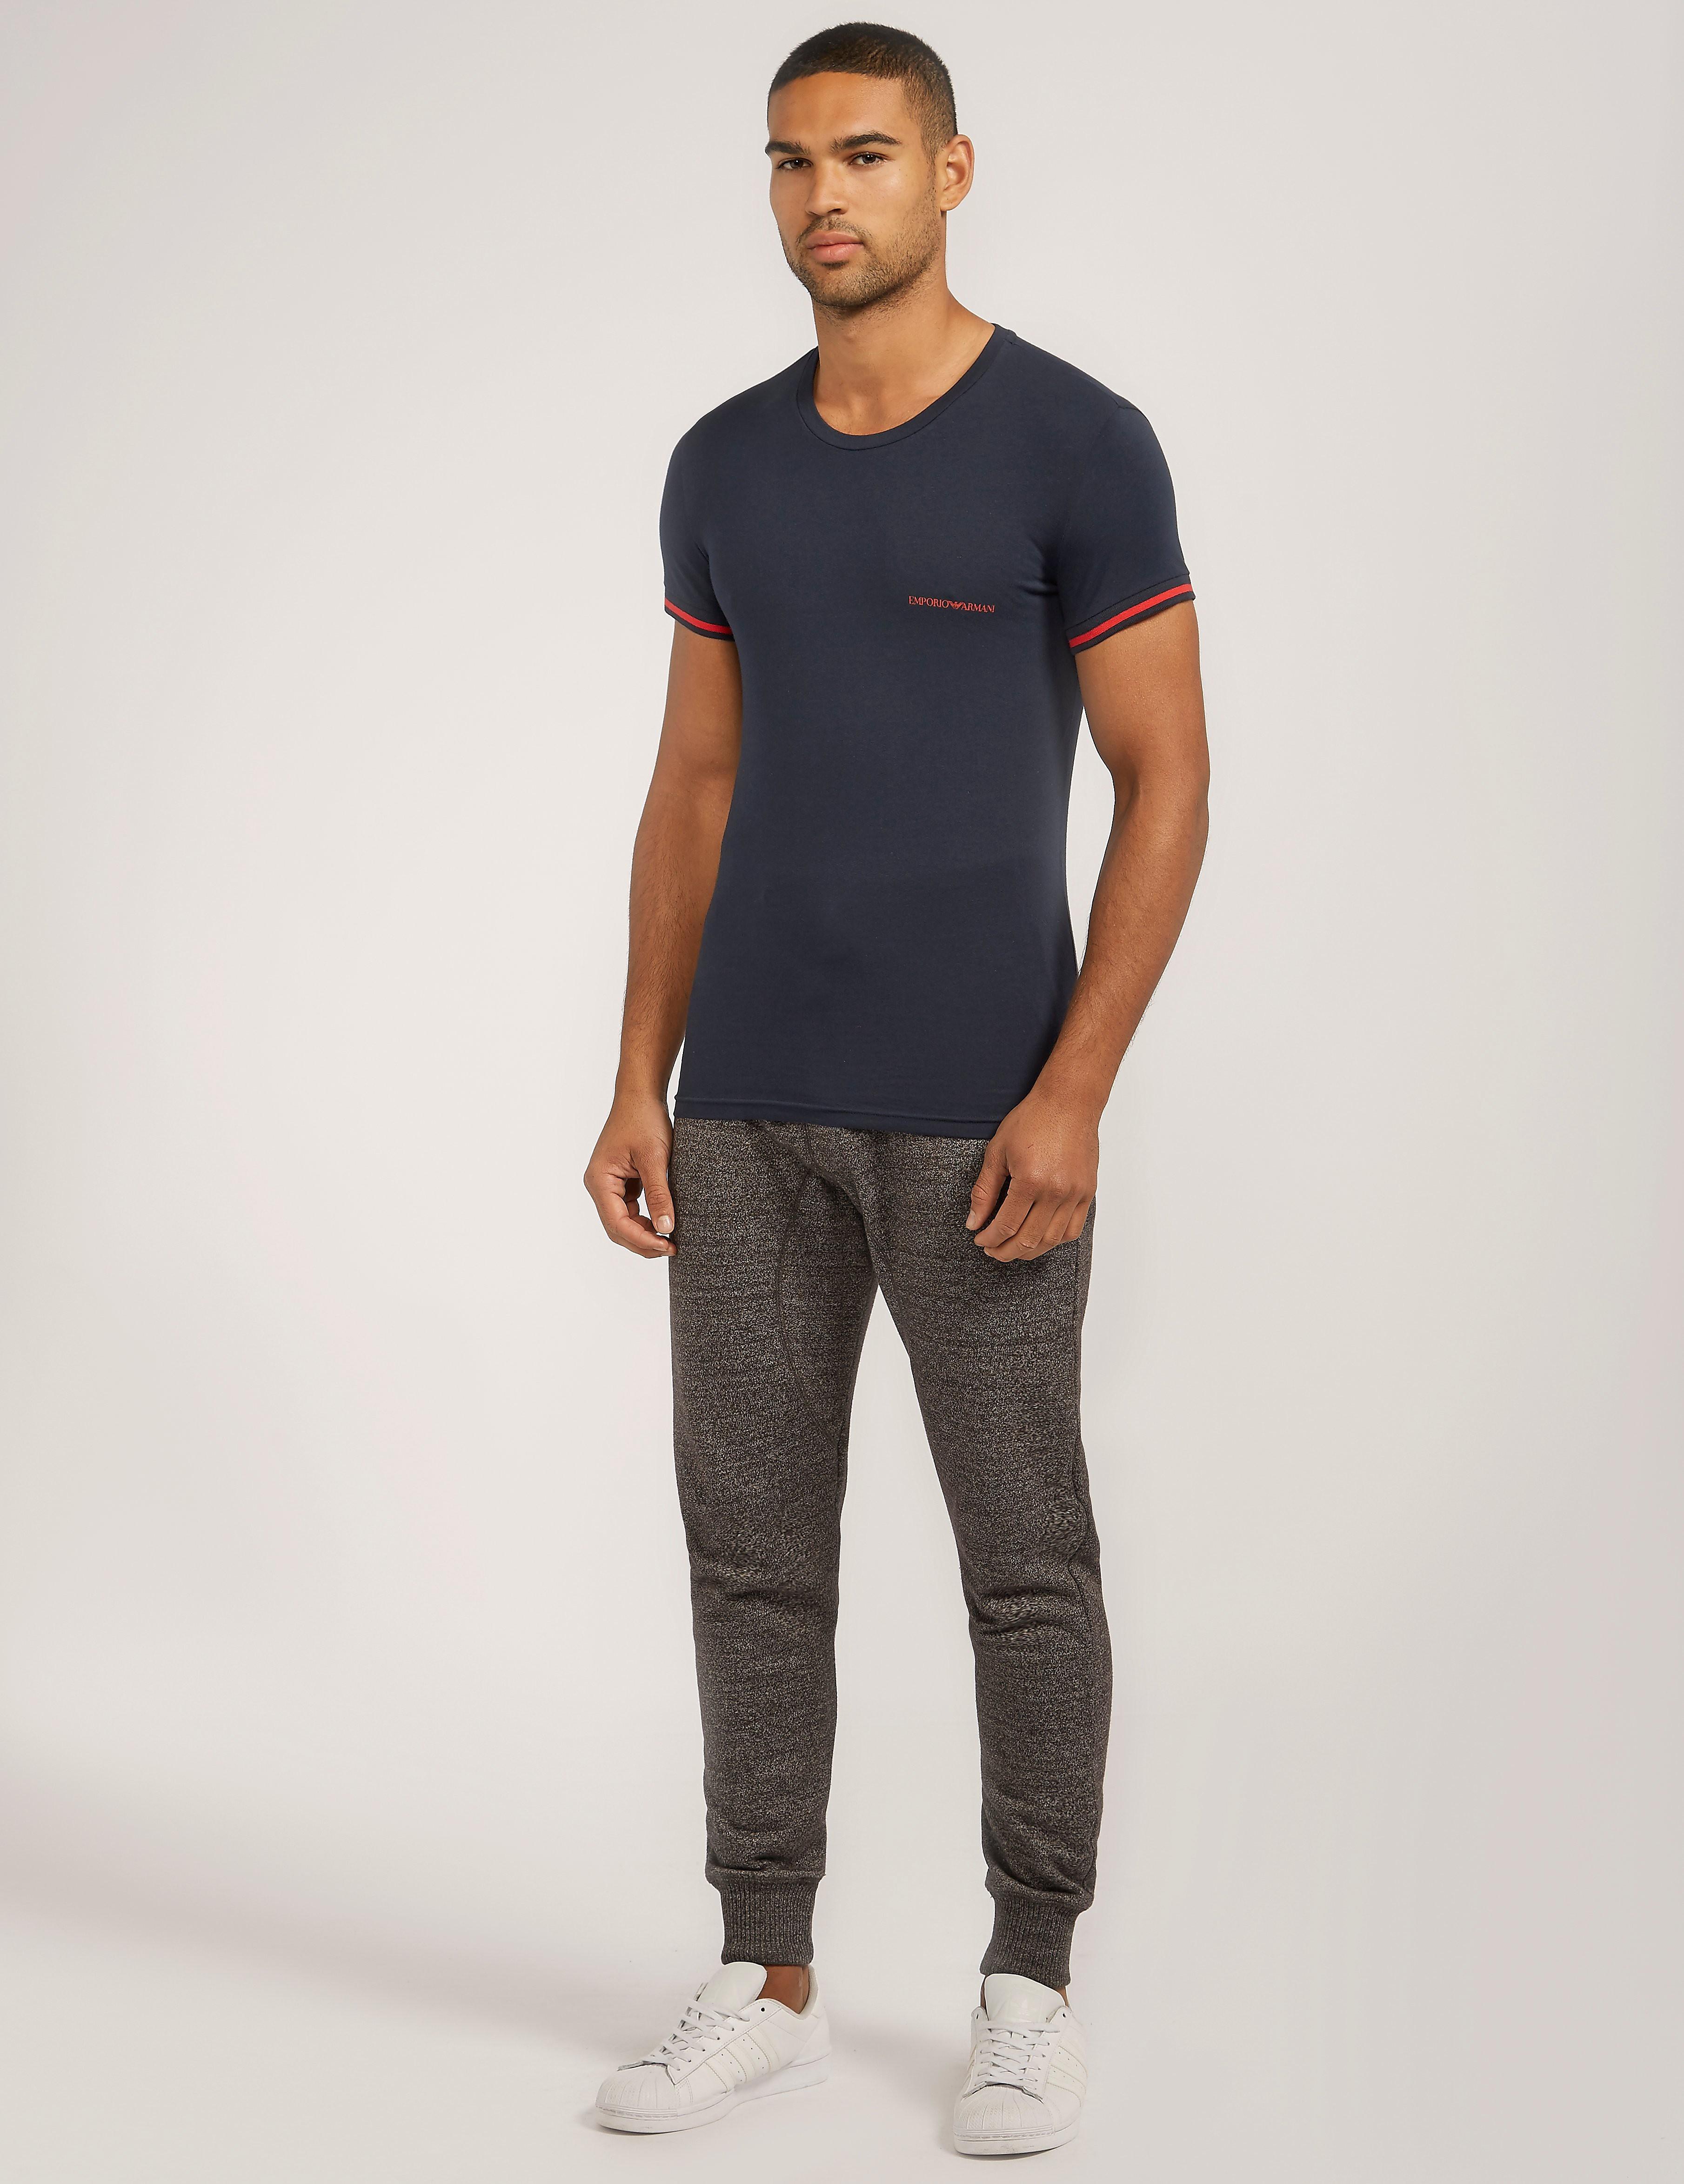 Emporio Armani Trim Short Sleeve T-Shirt